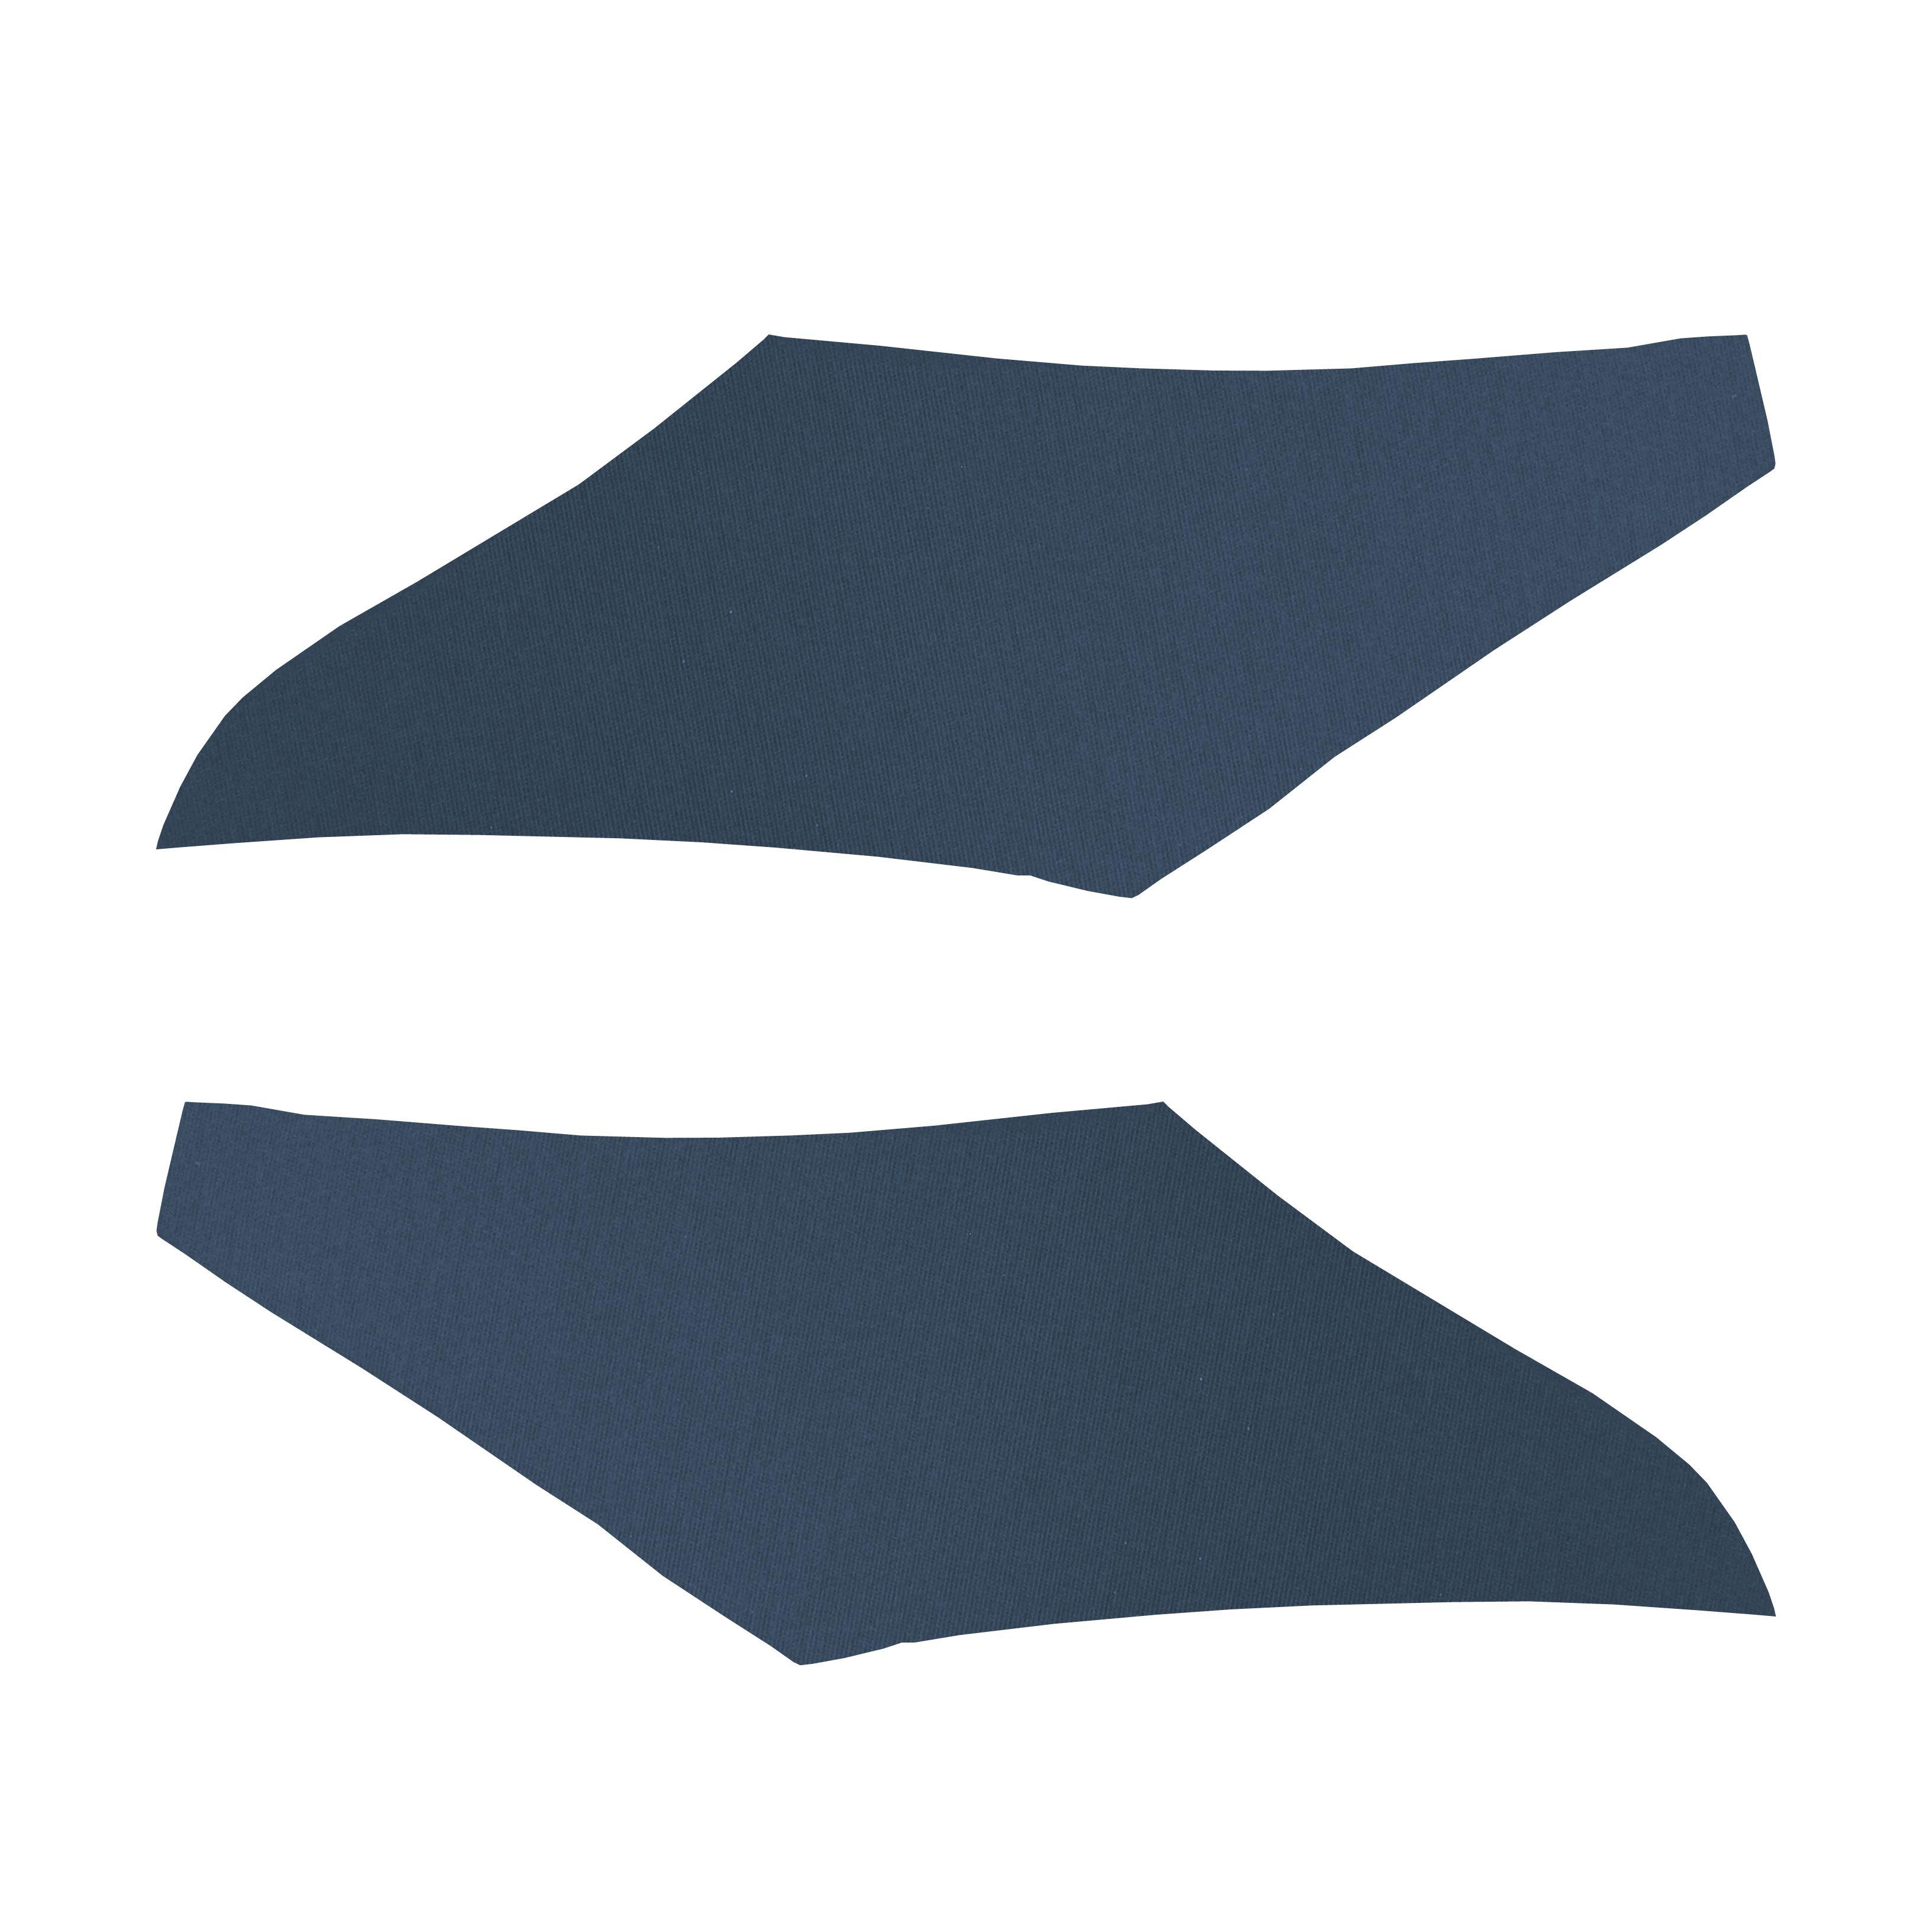 68/69 CHEVELLE/MALIBU SAIL PANELS - RIBBED DARK BLUE